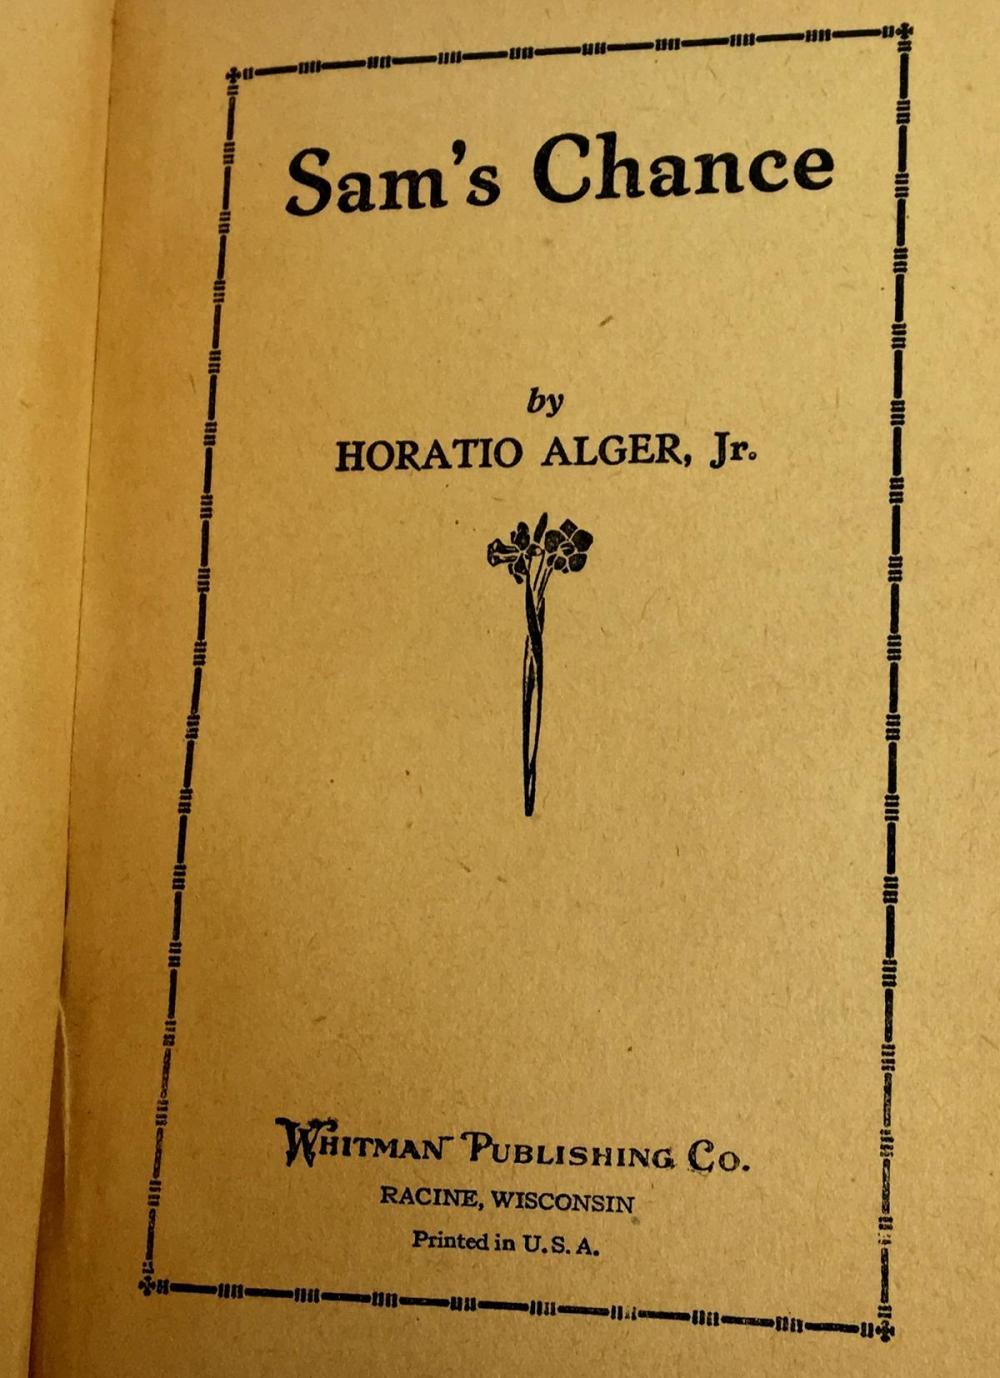 Sam's Chance by Horatio Alger Jr. c. 1920